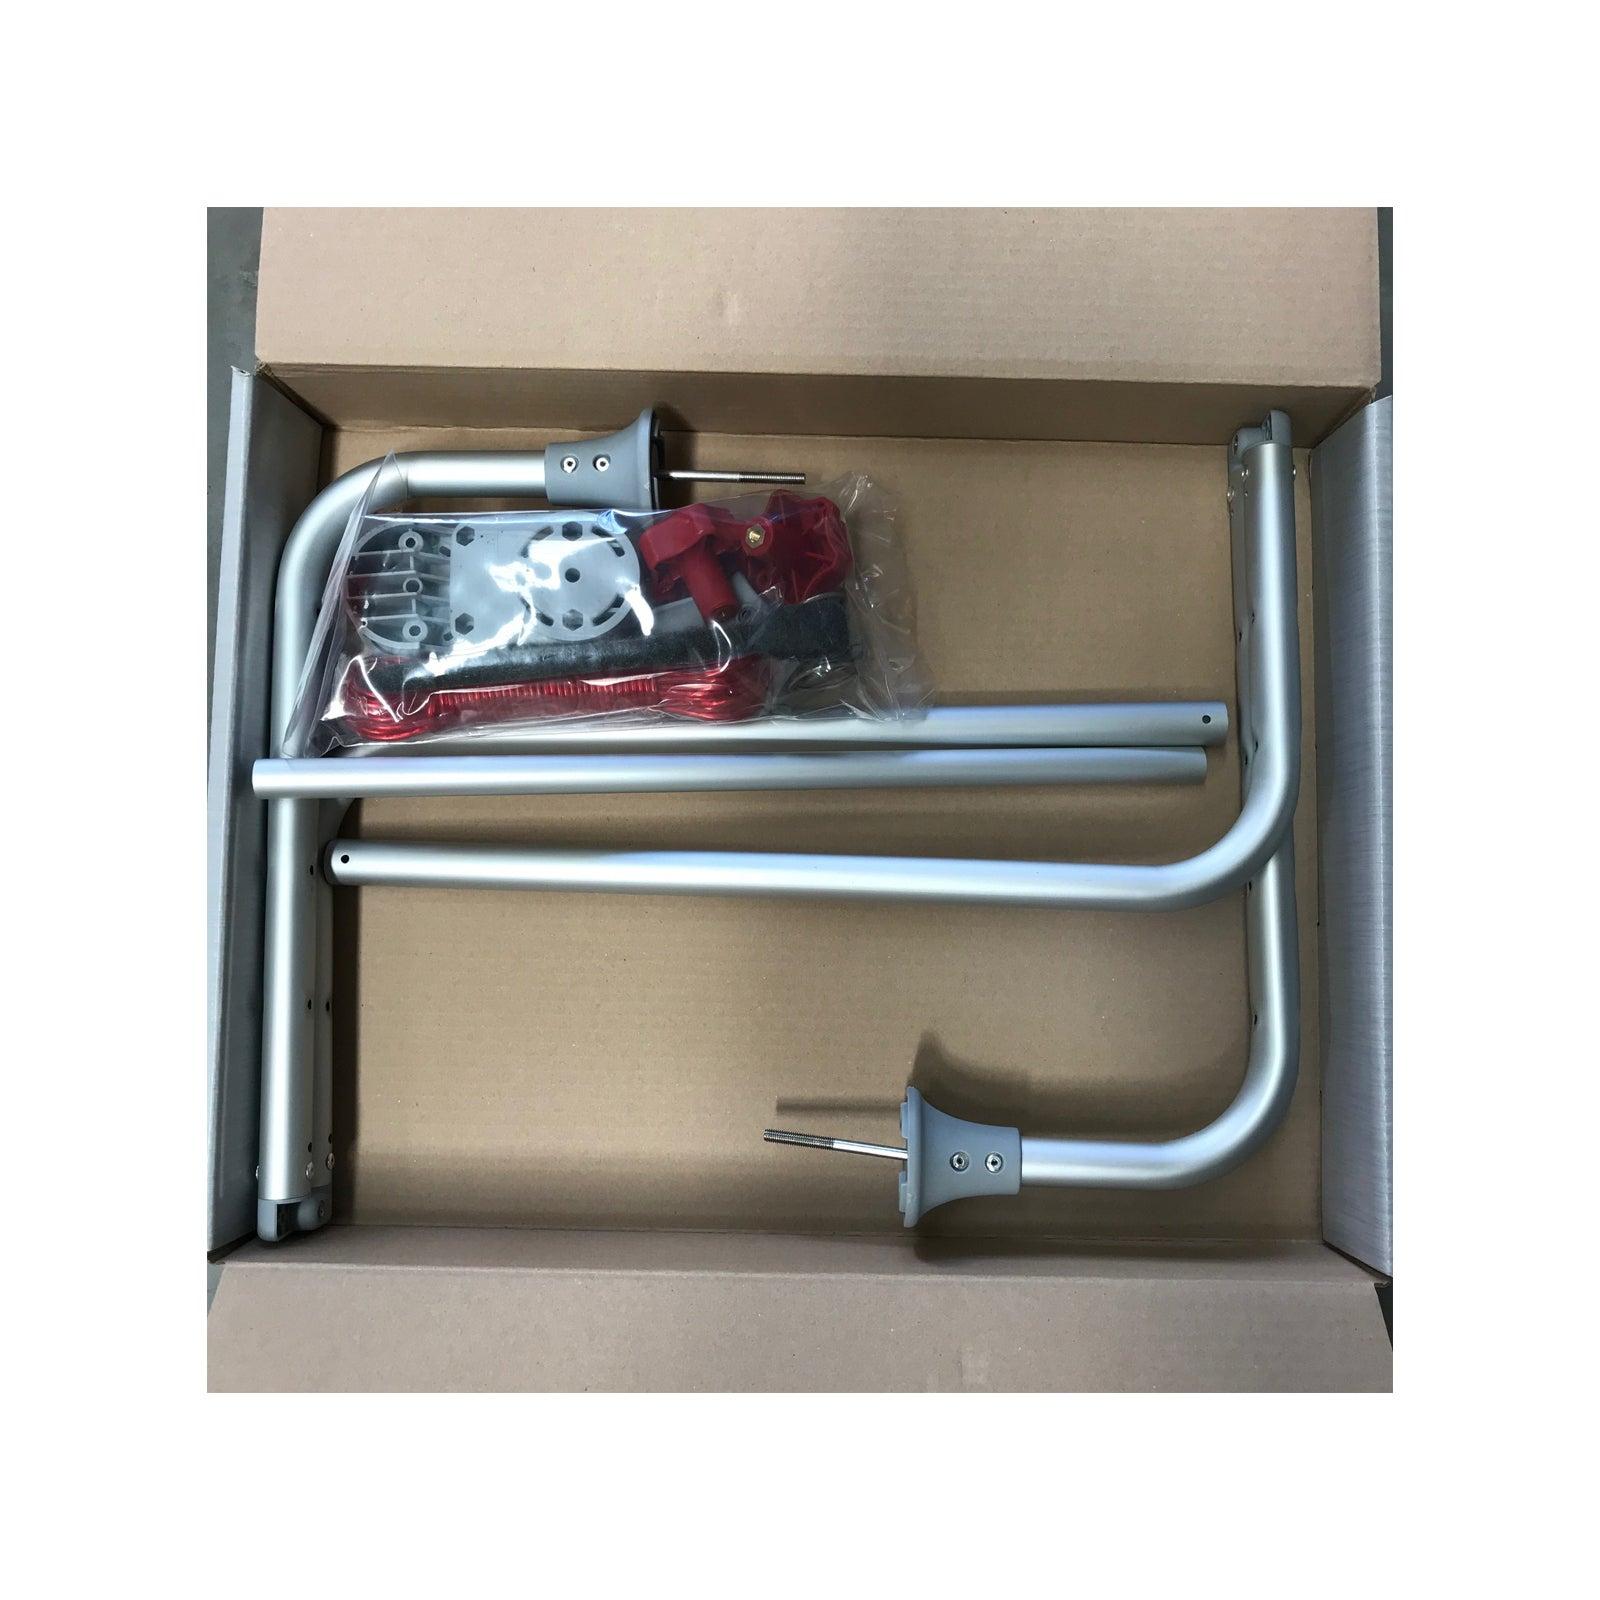 Caravan Fiamma Easy Dry Folding Clothes Rack Motorhome RV Camping Outdoor Camper